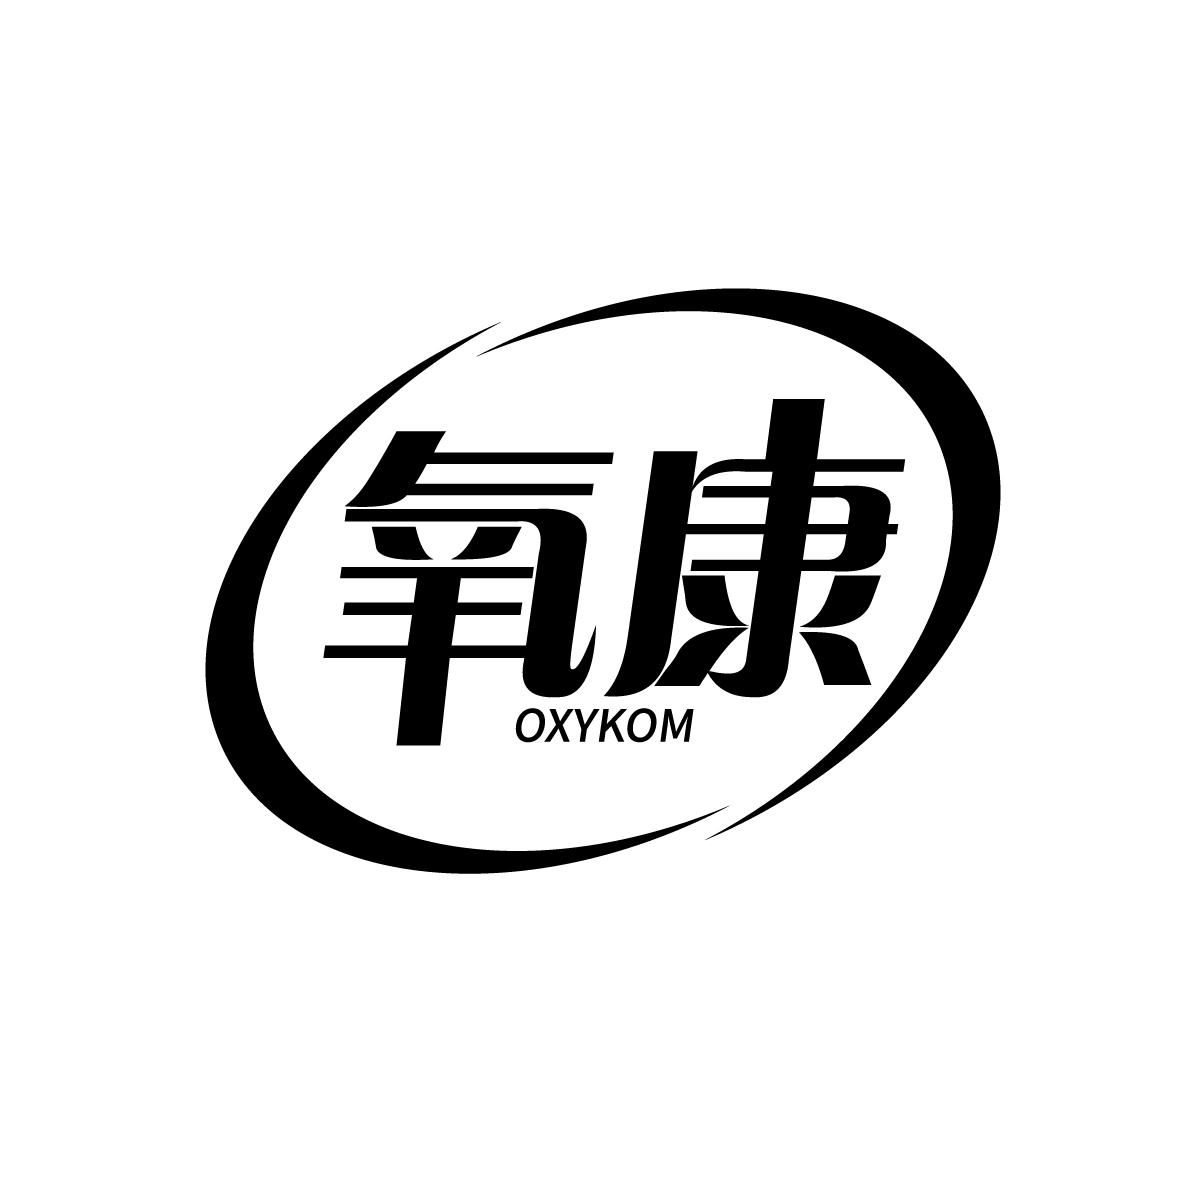 氧康 OXYKOM